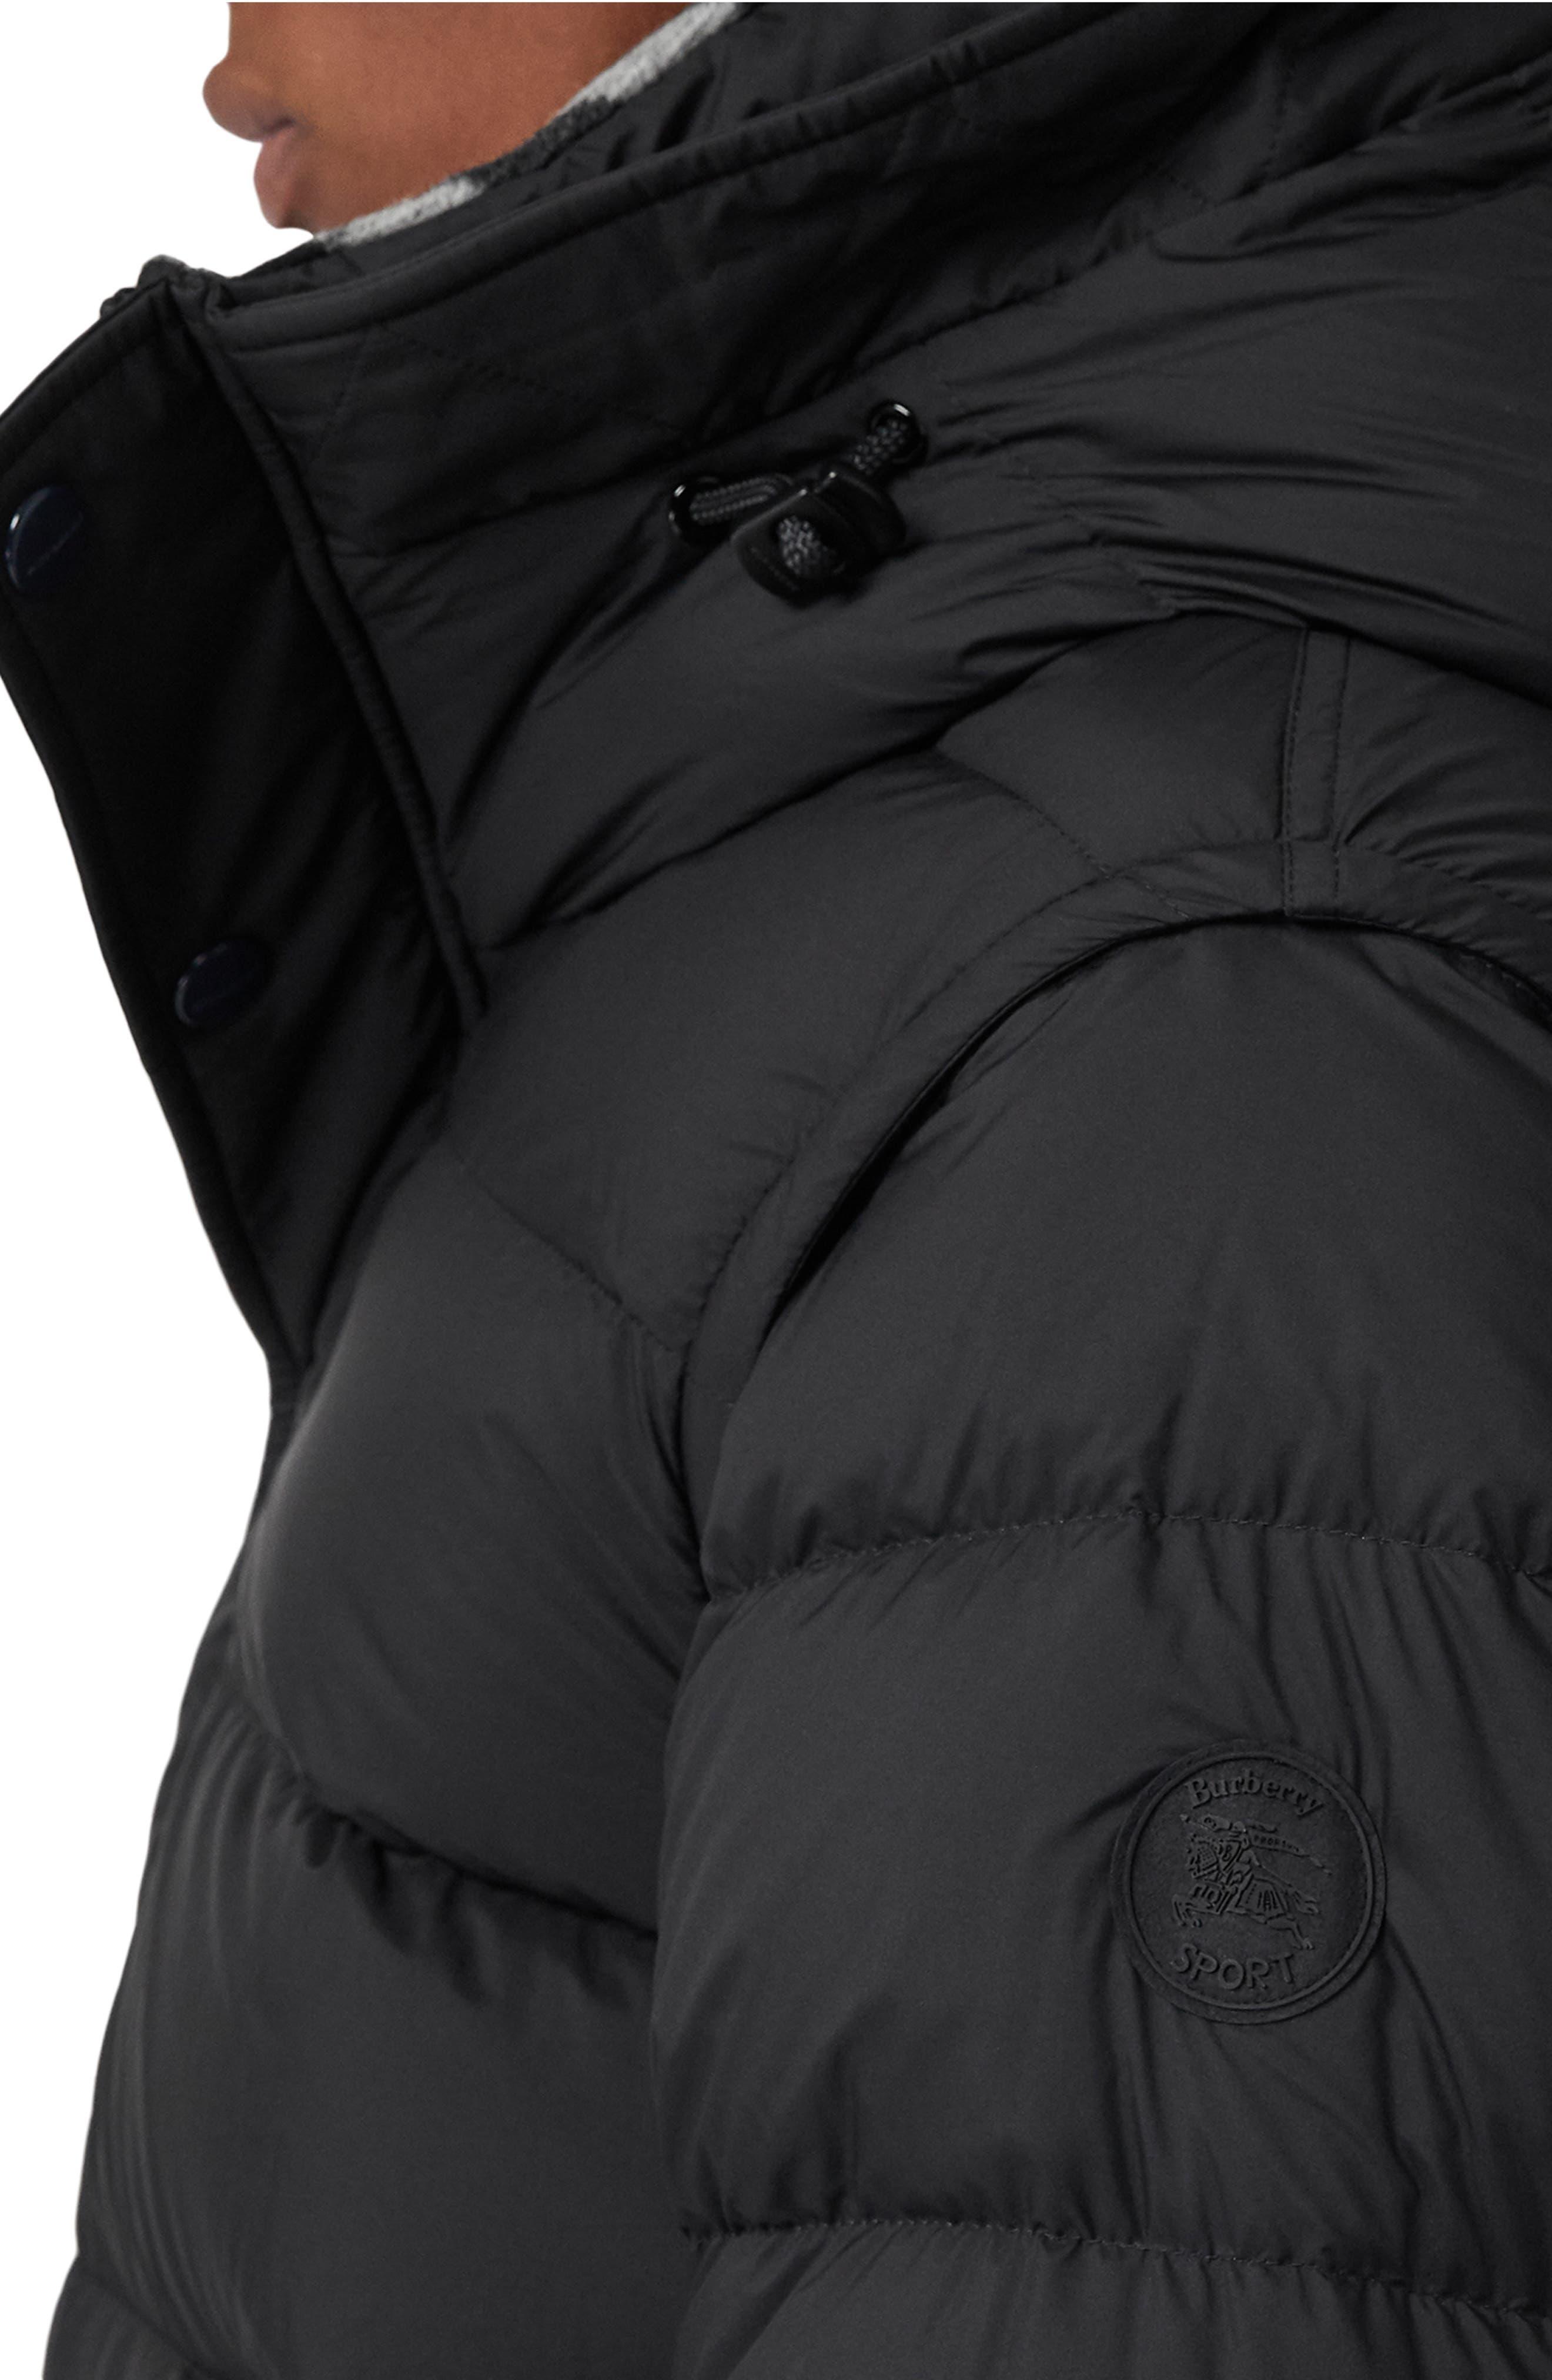 Hartley Hybrid Jacket with Detachable Sleeves,                             Alternate thumbnail 4, color,                             001